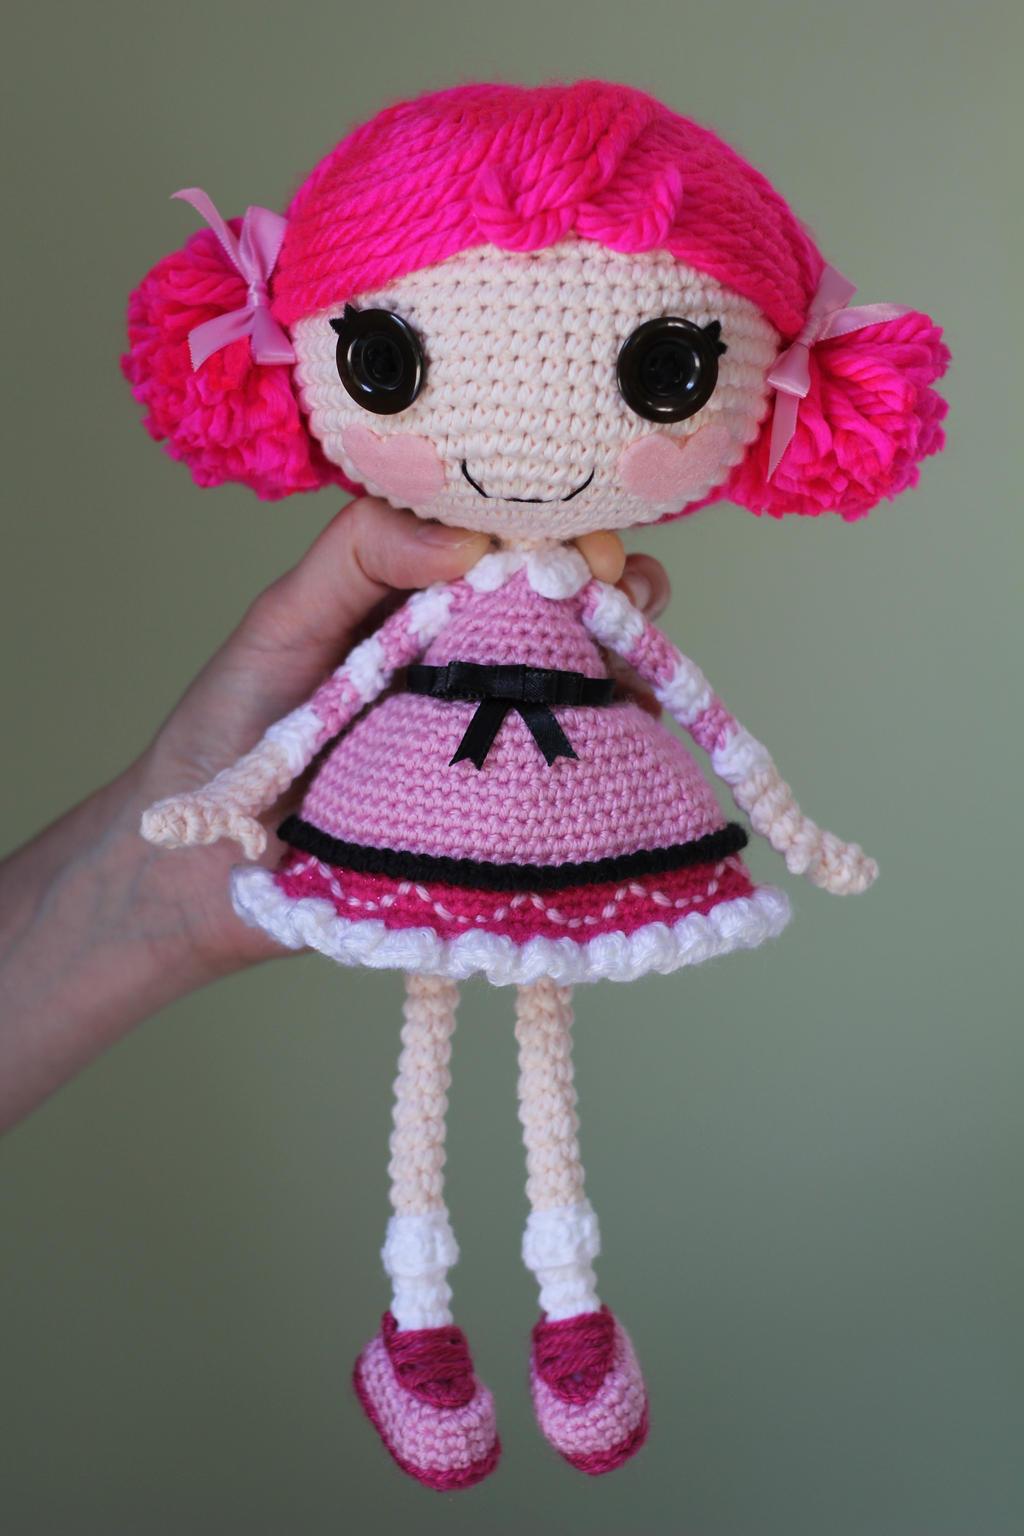 Sock Monkey Amigurumi Pattern : LALALOOPSY Toffee Cocoa Cuddles Amigurumi Doll by Npantz22 ...